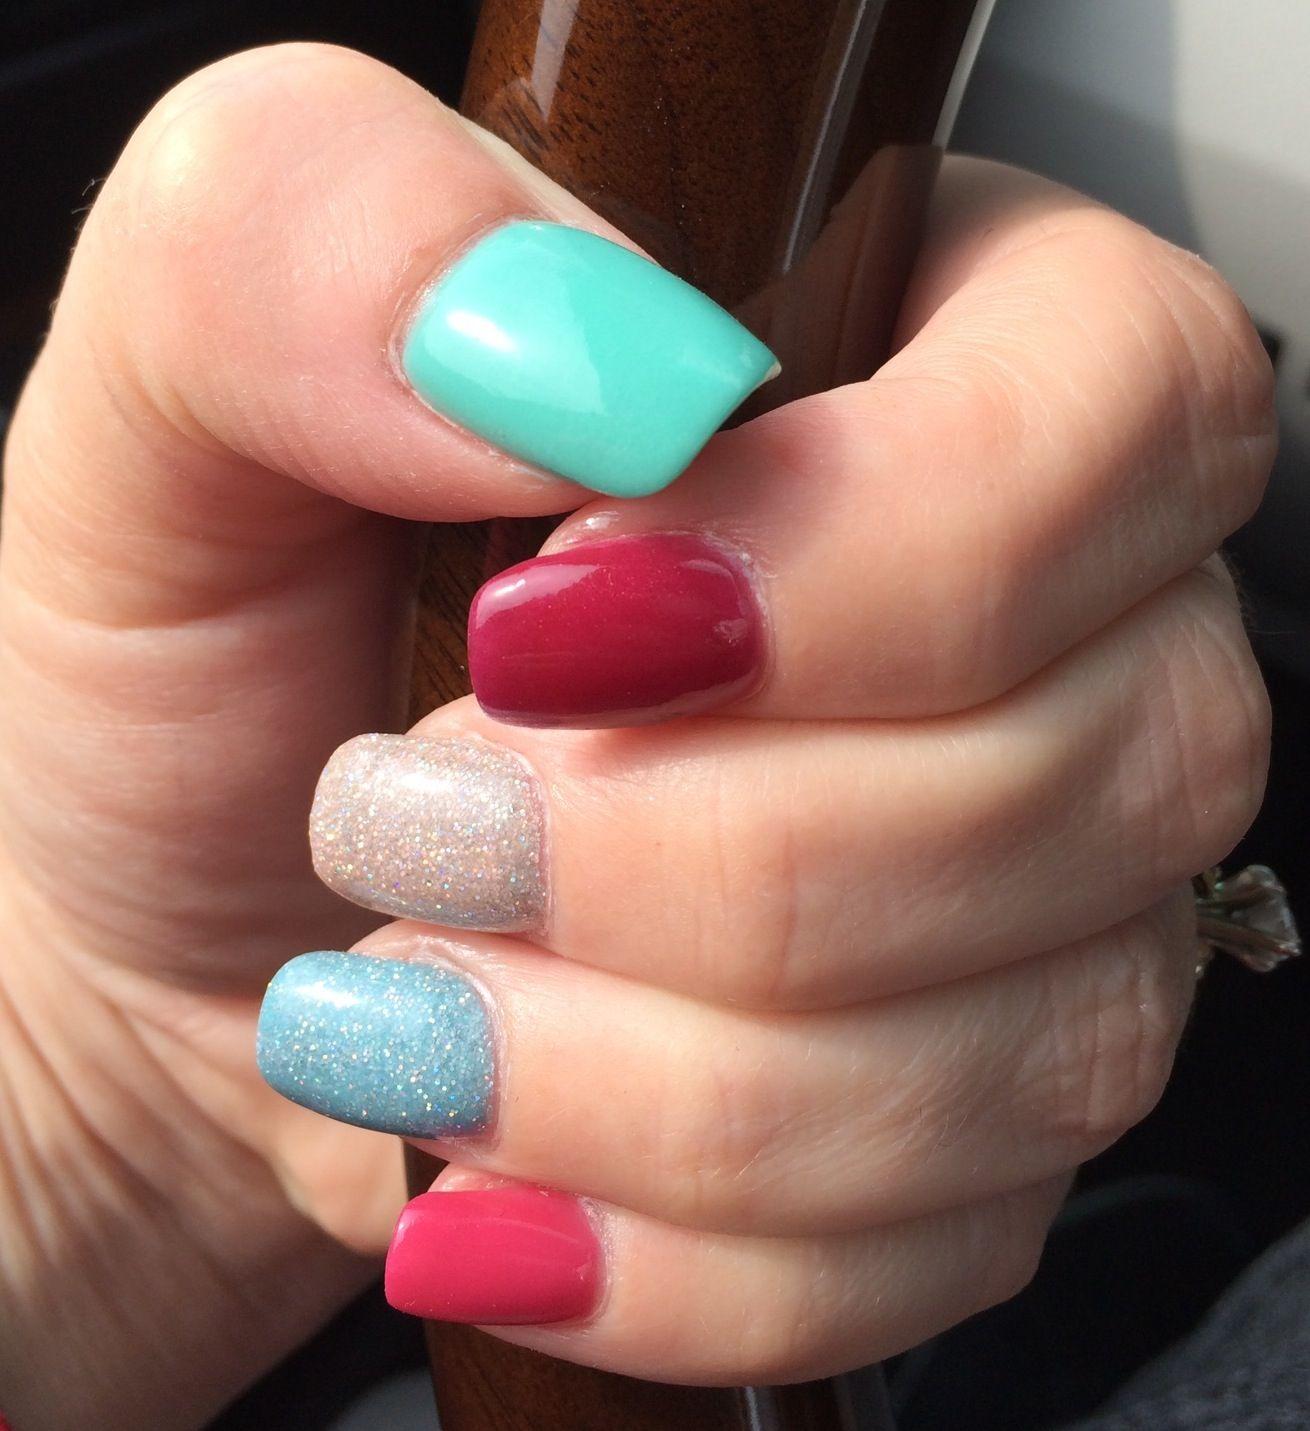 Fashion Nail Beauty Spa Elizabeth Nj: Hot Pink, Blue Glitter, Sand